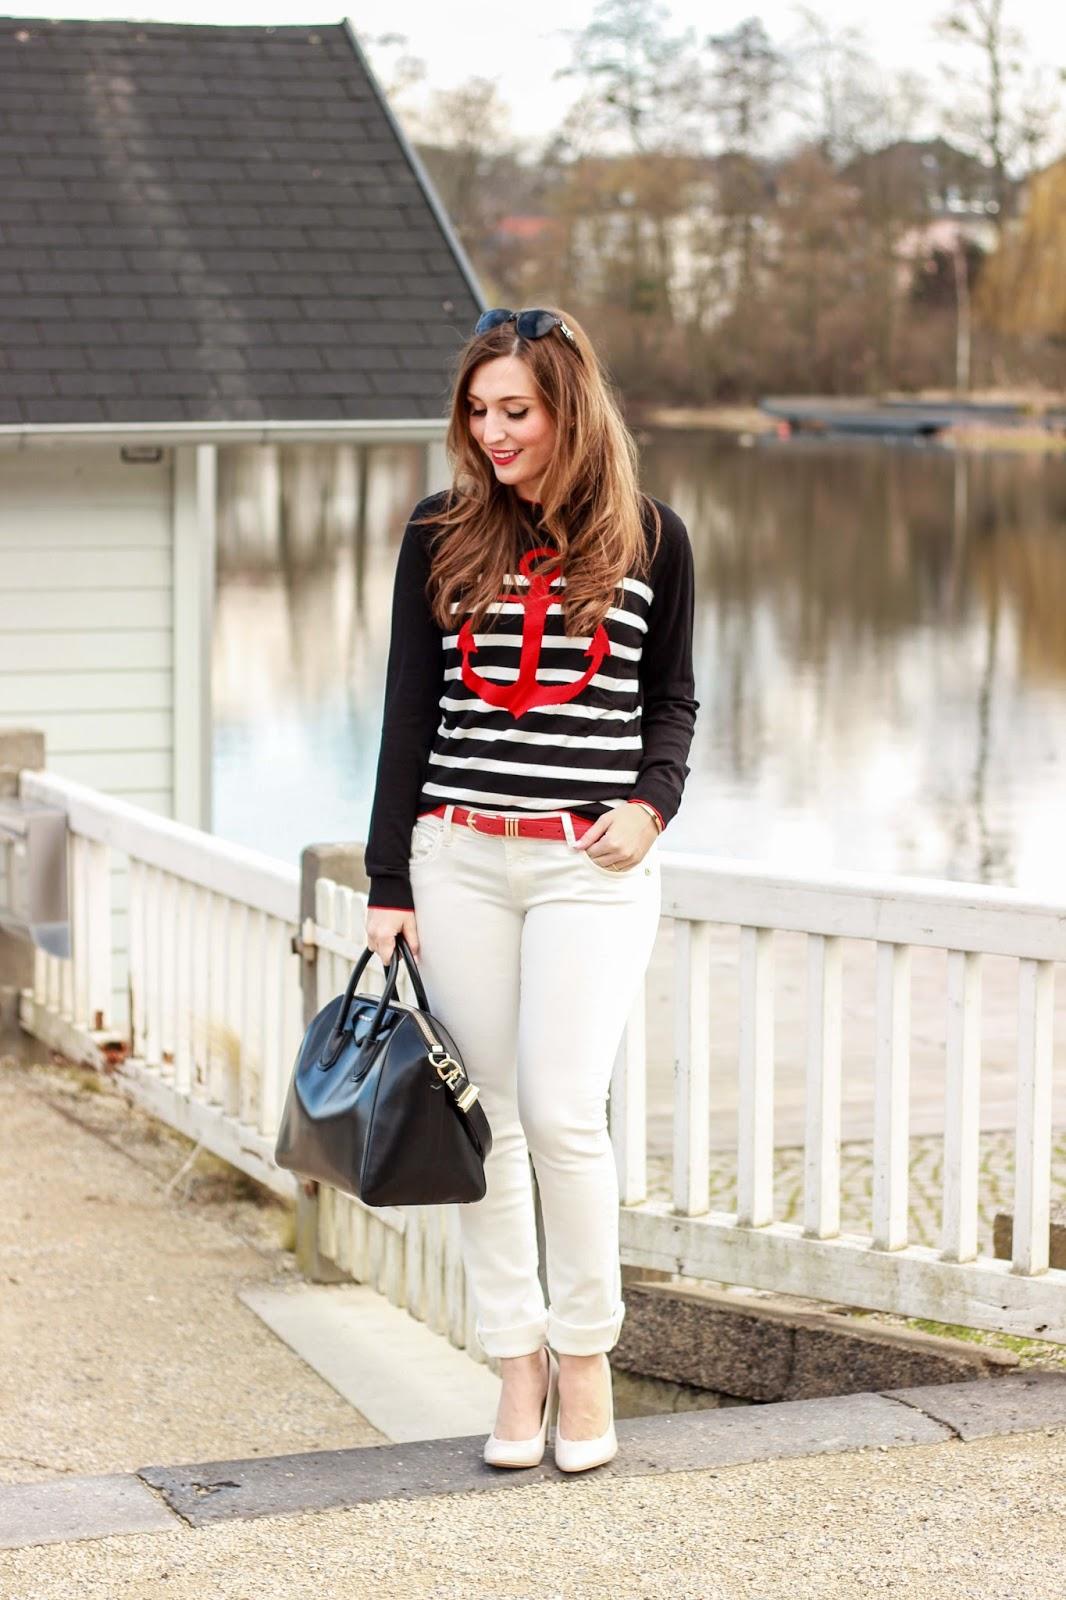 Conleys-Conleys Pullover-Pullover von Conleys-Fashionstylebyjohanna-Fashionblogger aus Deutschland-Deutsche Fashionblogger - Lifestyleblog